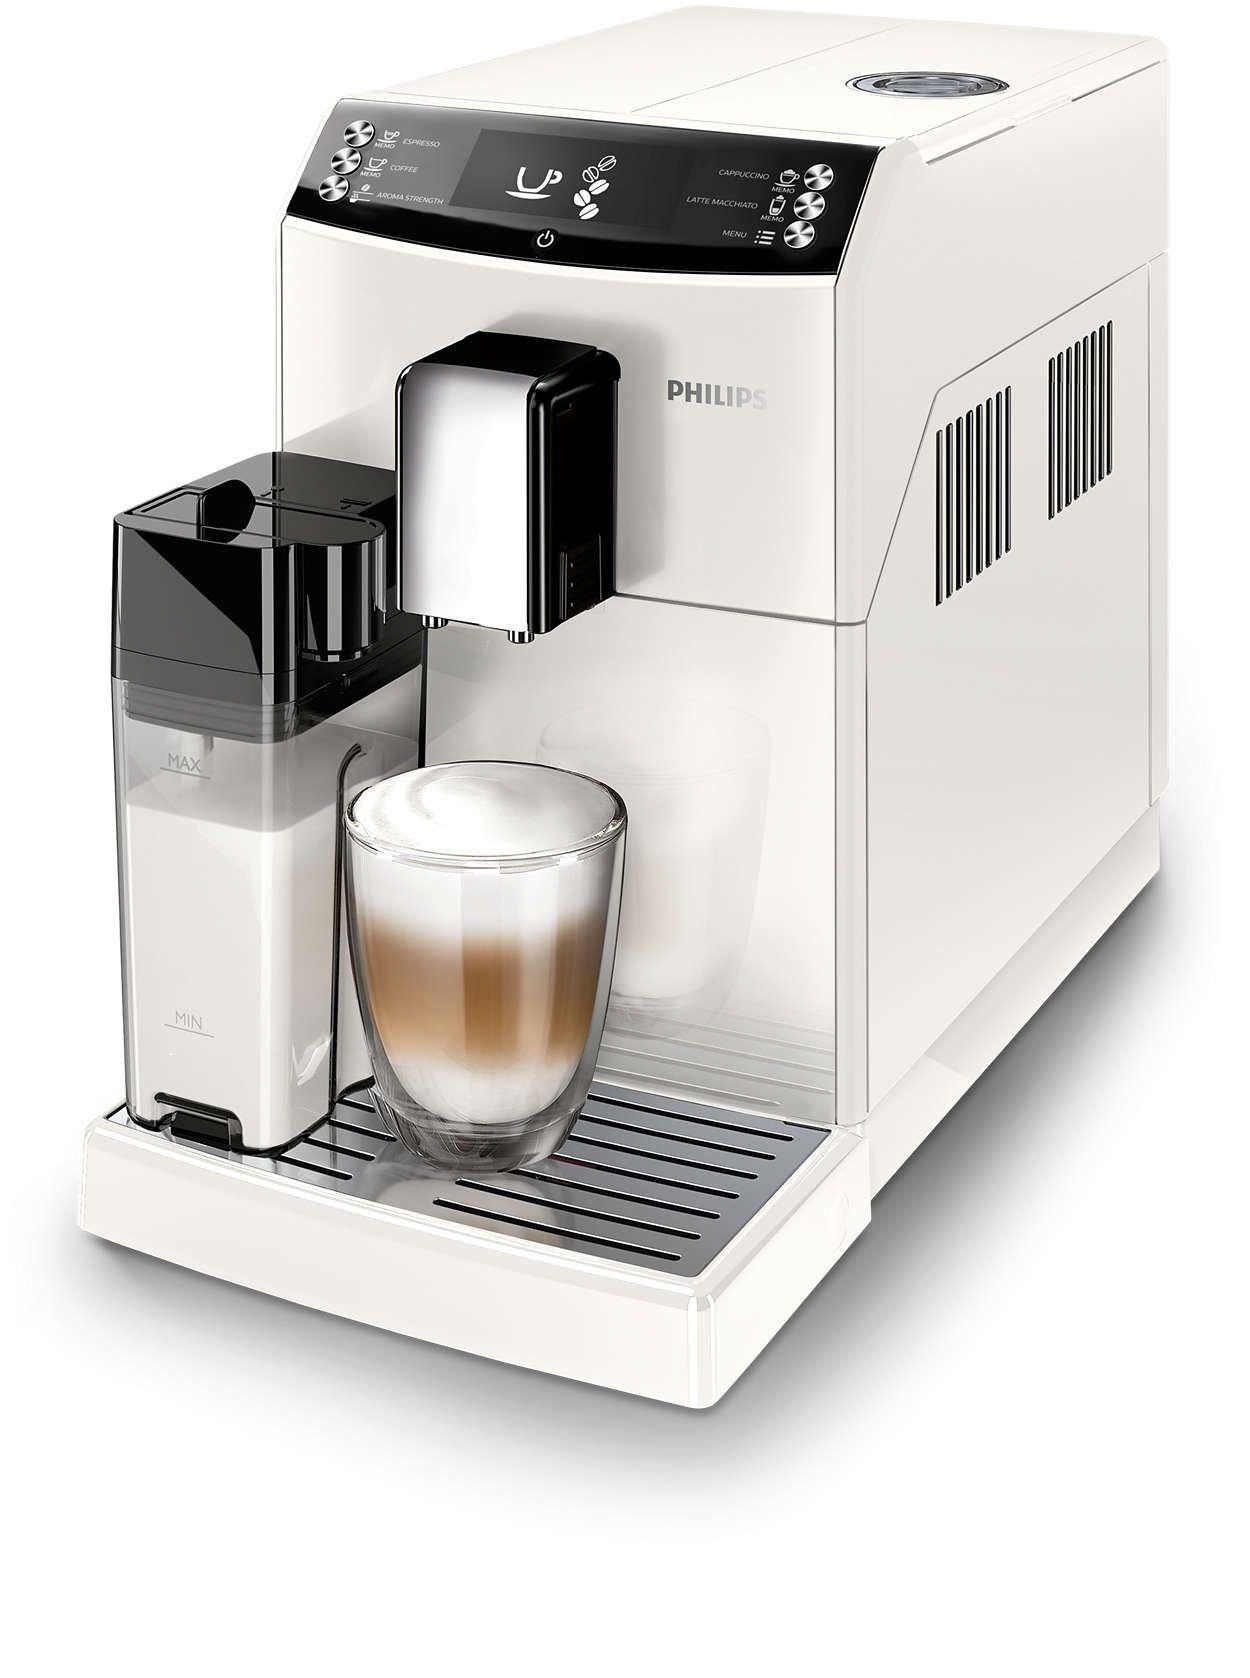 [Amazon.de] Philips EP3362/00 Kaffeevollautomat